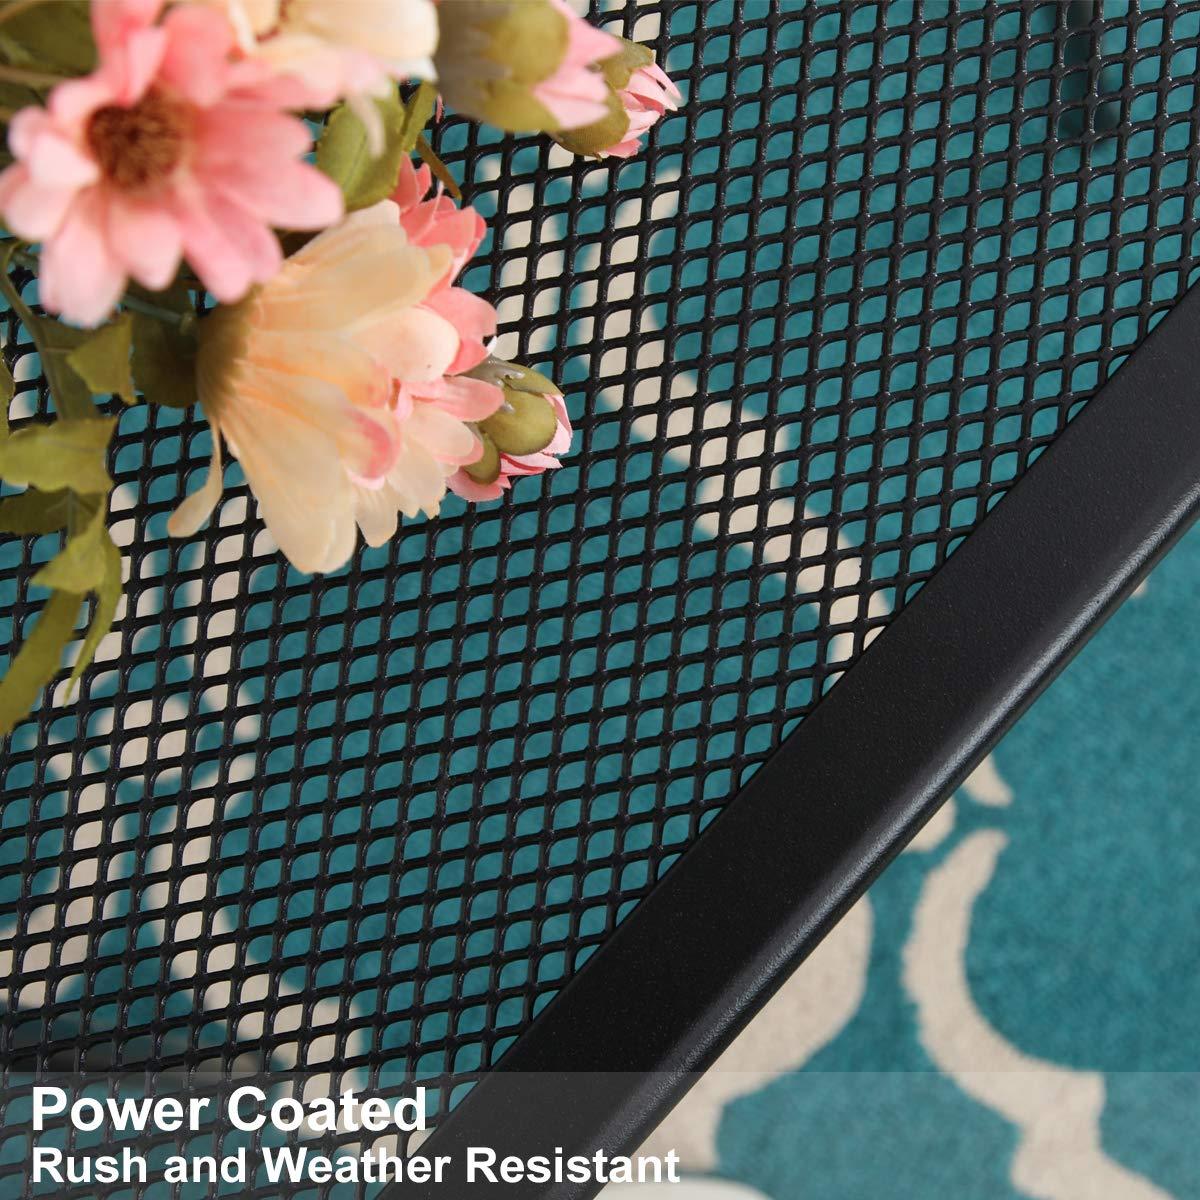 MF 27 Black Patio Metal Steel Mesh Square Bistro Dining Table for Garden,Backyard,Balcony,Kitchen